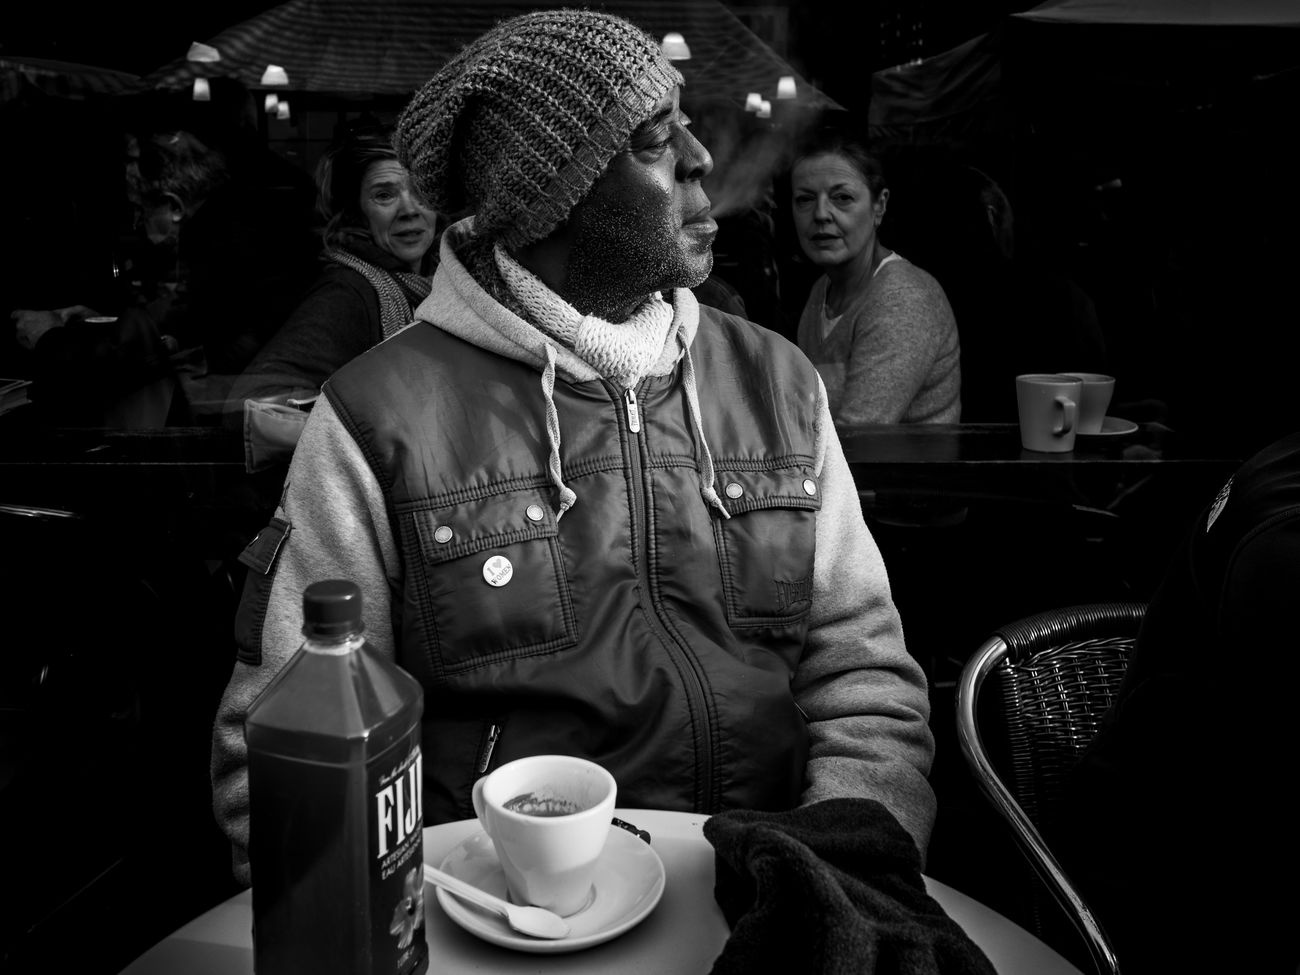 Spectators Rawstreets Stranger Olympus Pen-f London Lifestyle Portrait Lifestyles 35mm Street Portraiture Black And White Photography Monochrome Photography Streetlife Prime Lens Maxgor.com Maxgor London City Life Candid People Streetphotography Shadow Light And Dark Light And Shadow The City Light Street Photography City